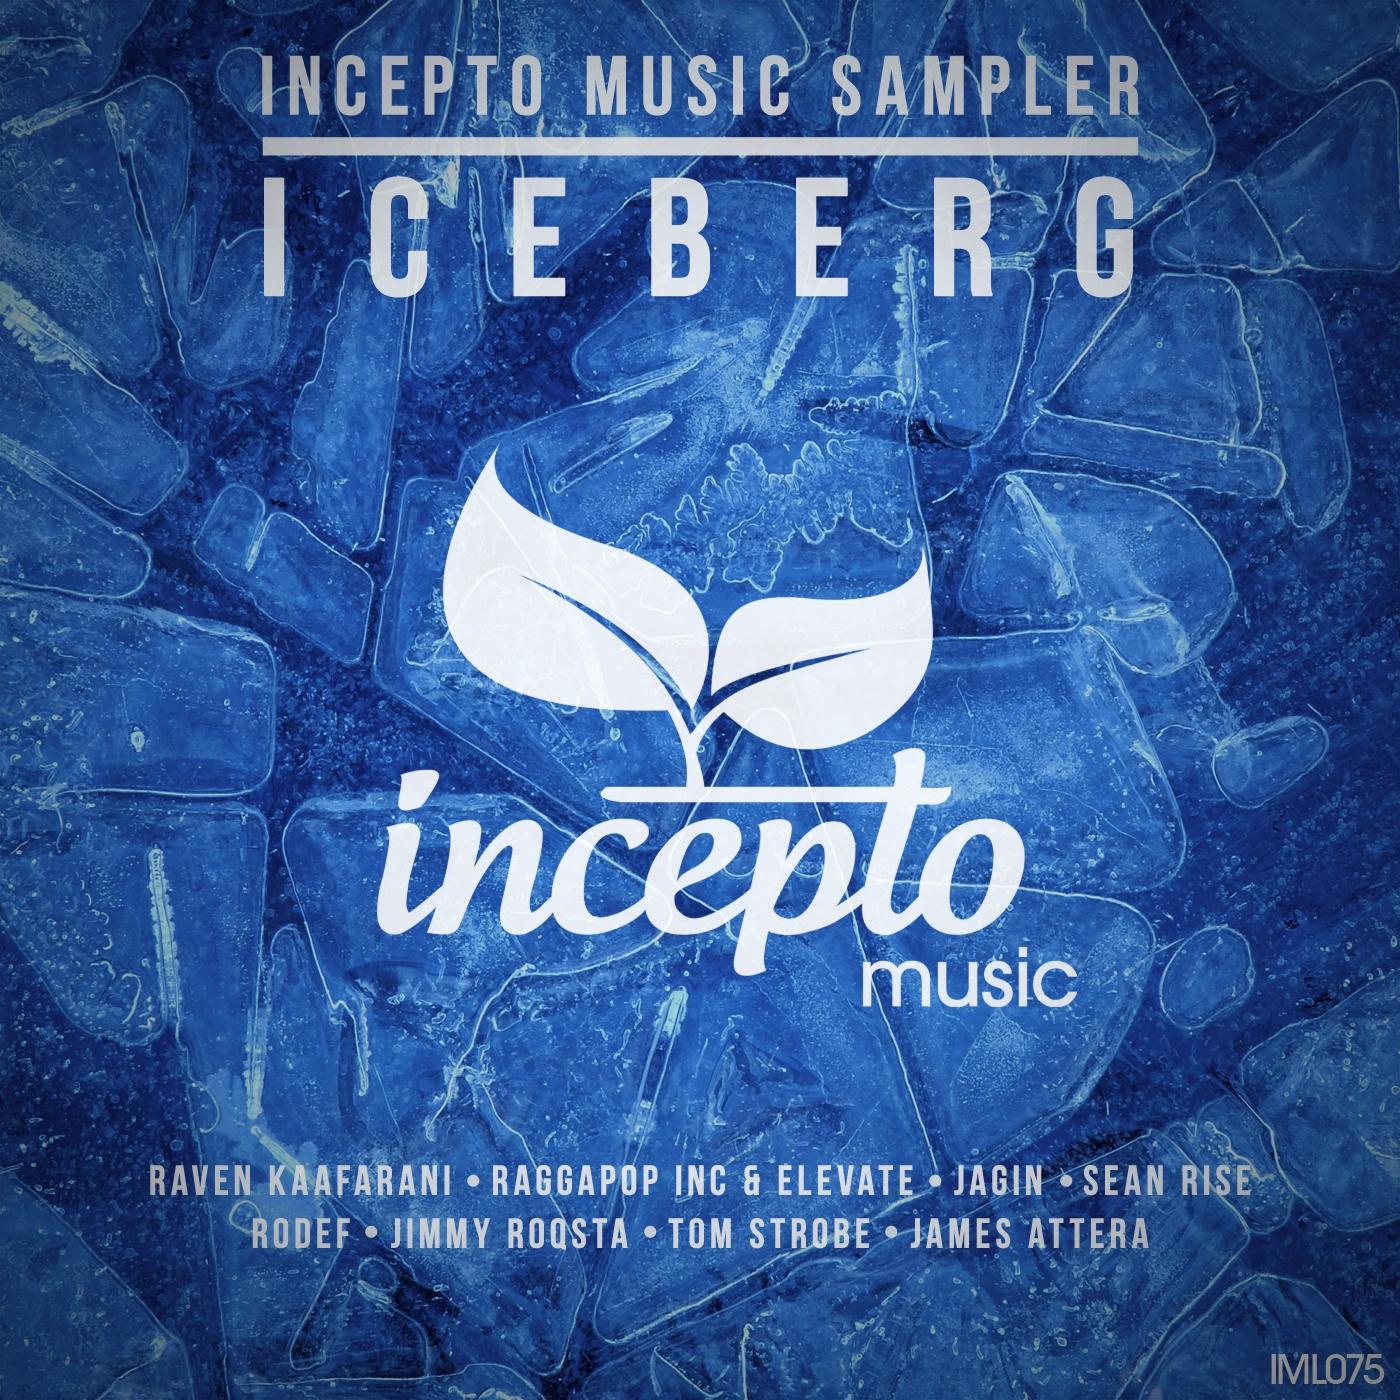 Raggapop Inc & Elevate - Interconnected (Original Mix)